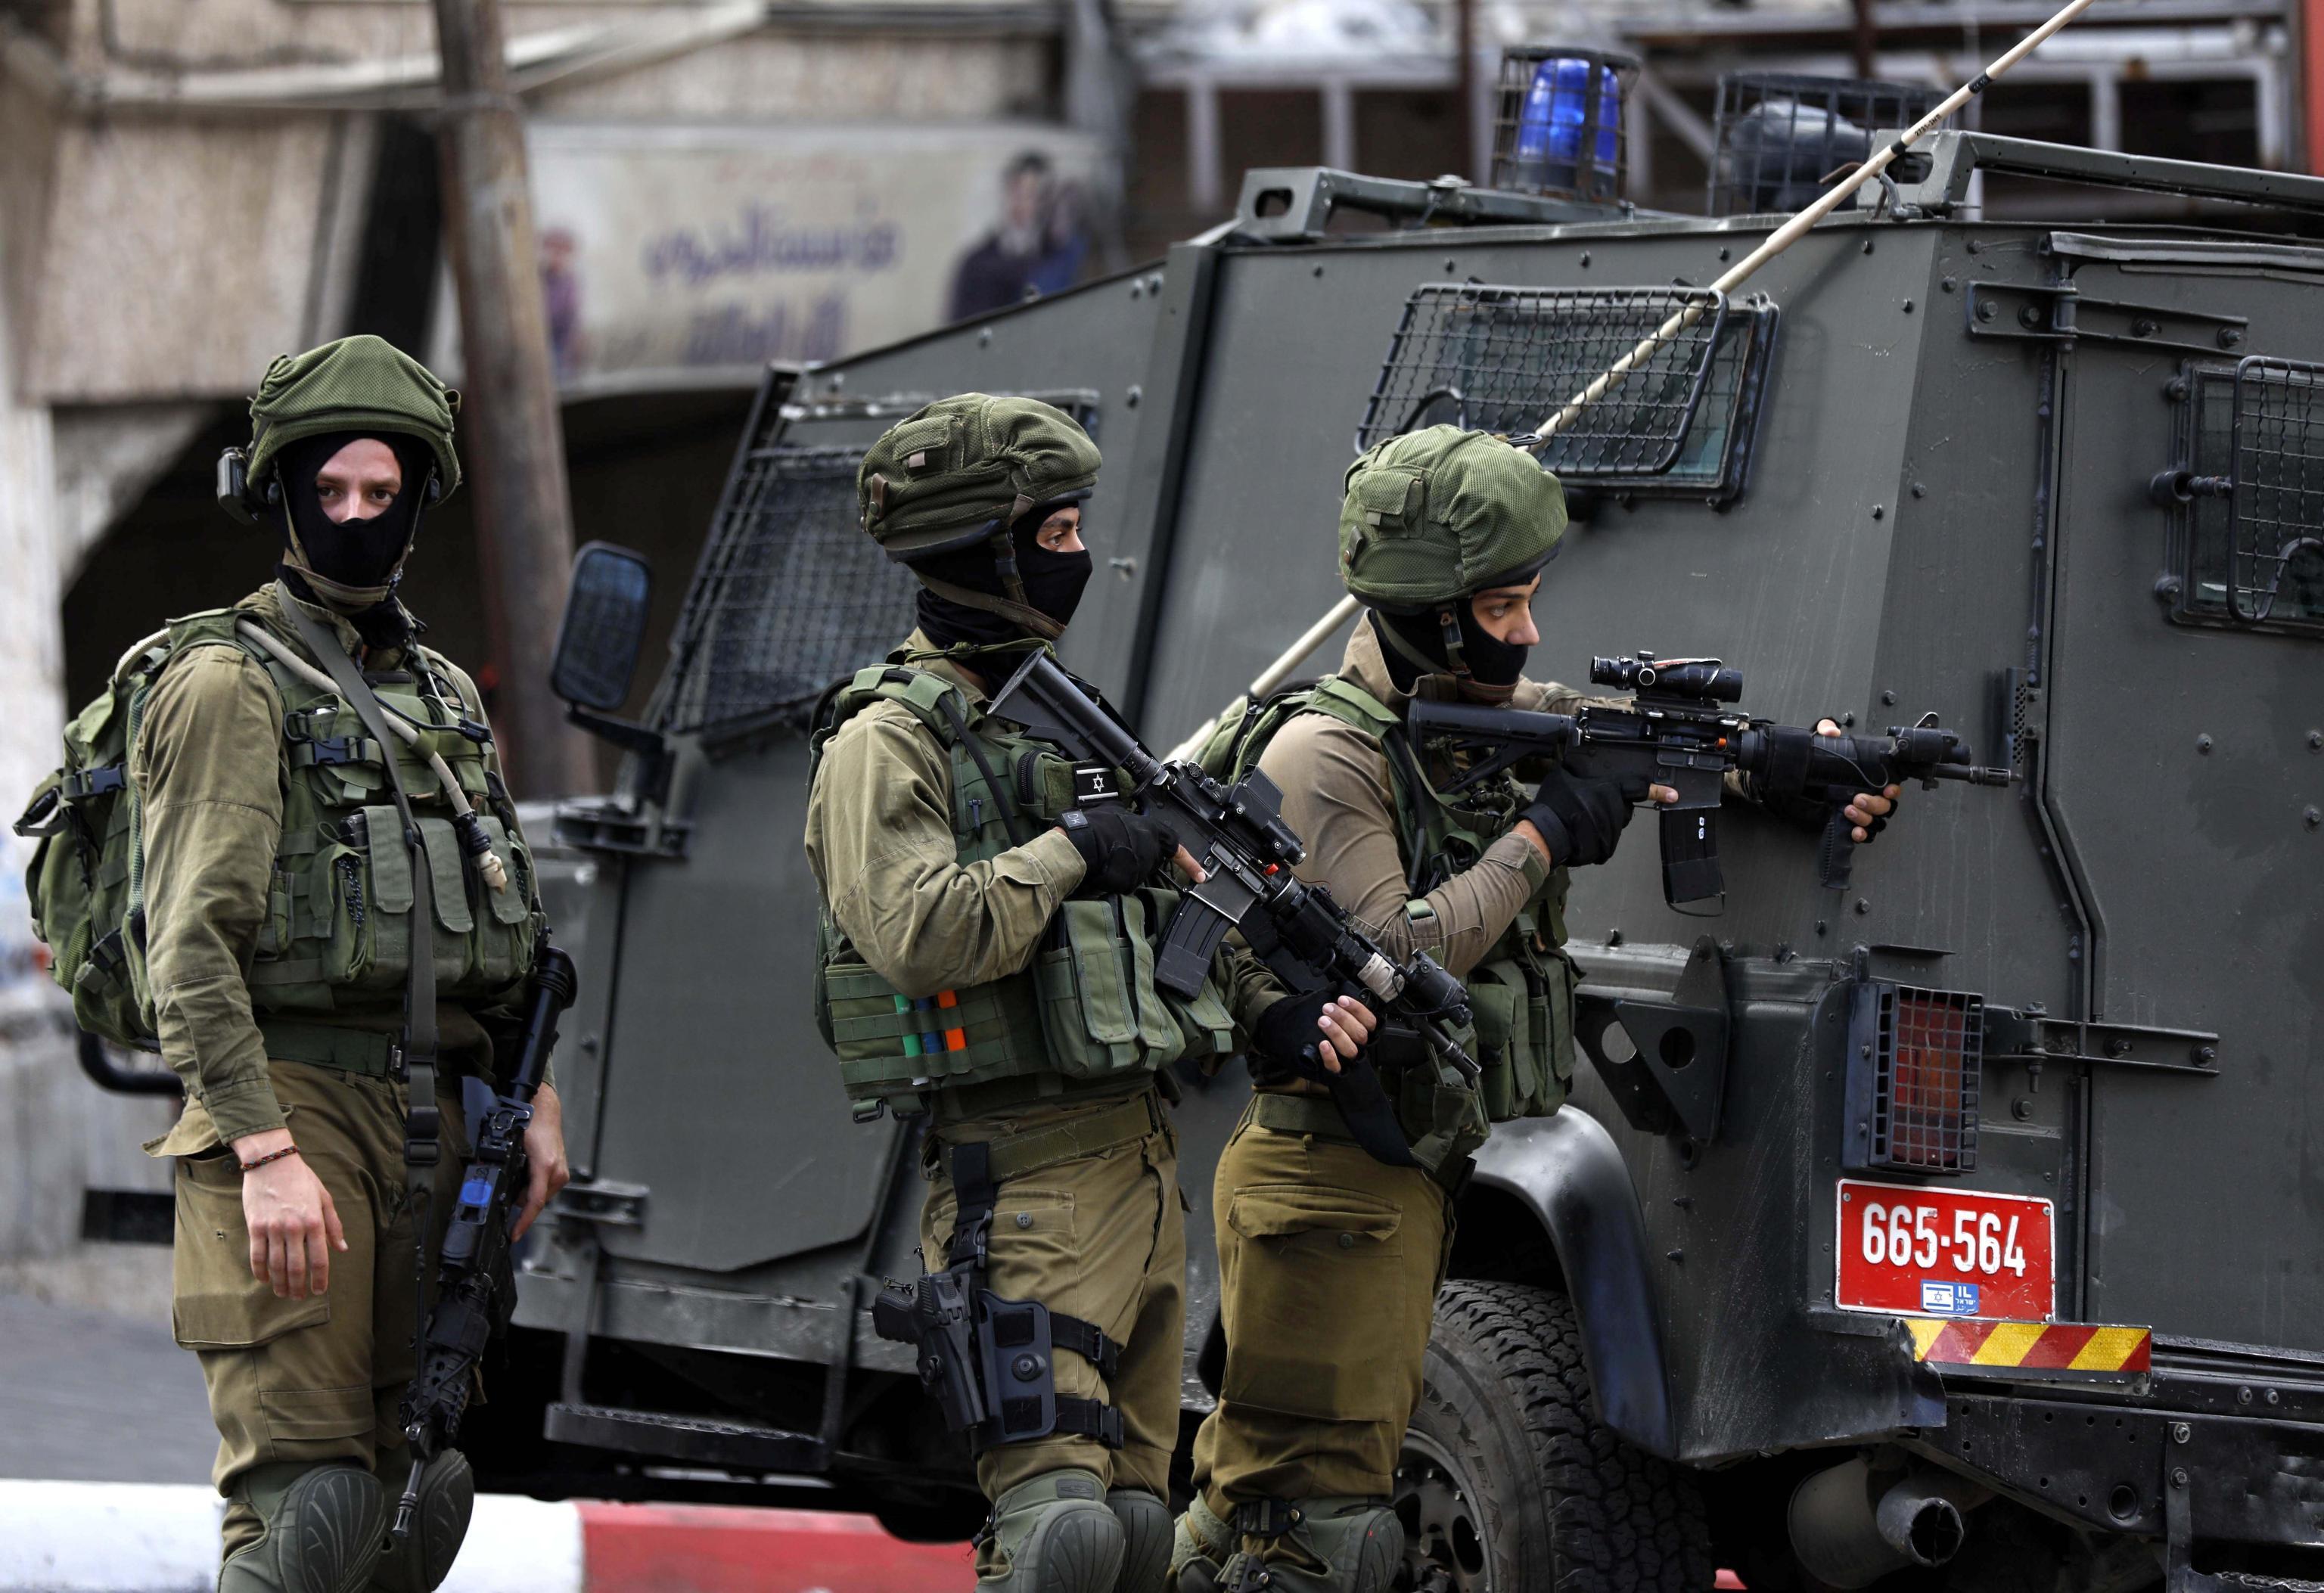 Israele a Jihadisti, giocate con fuoco